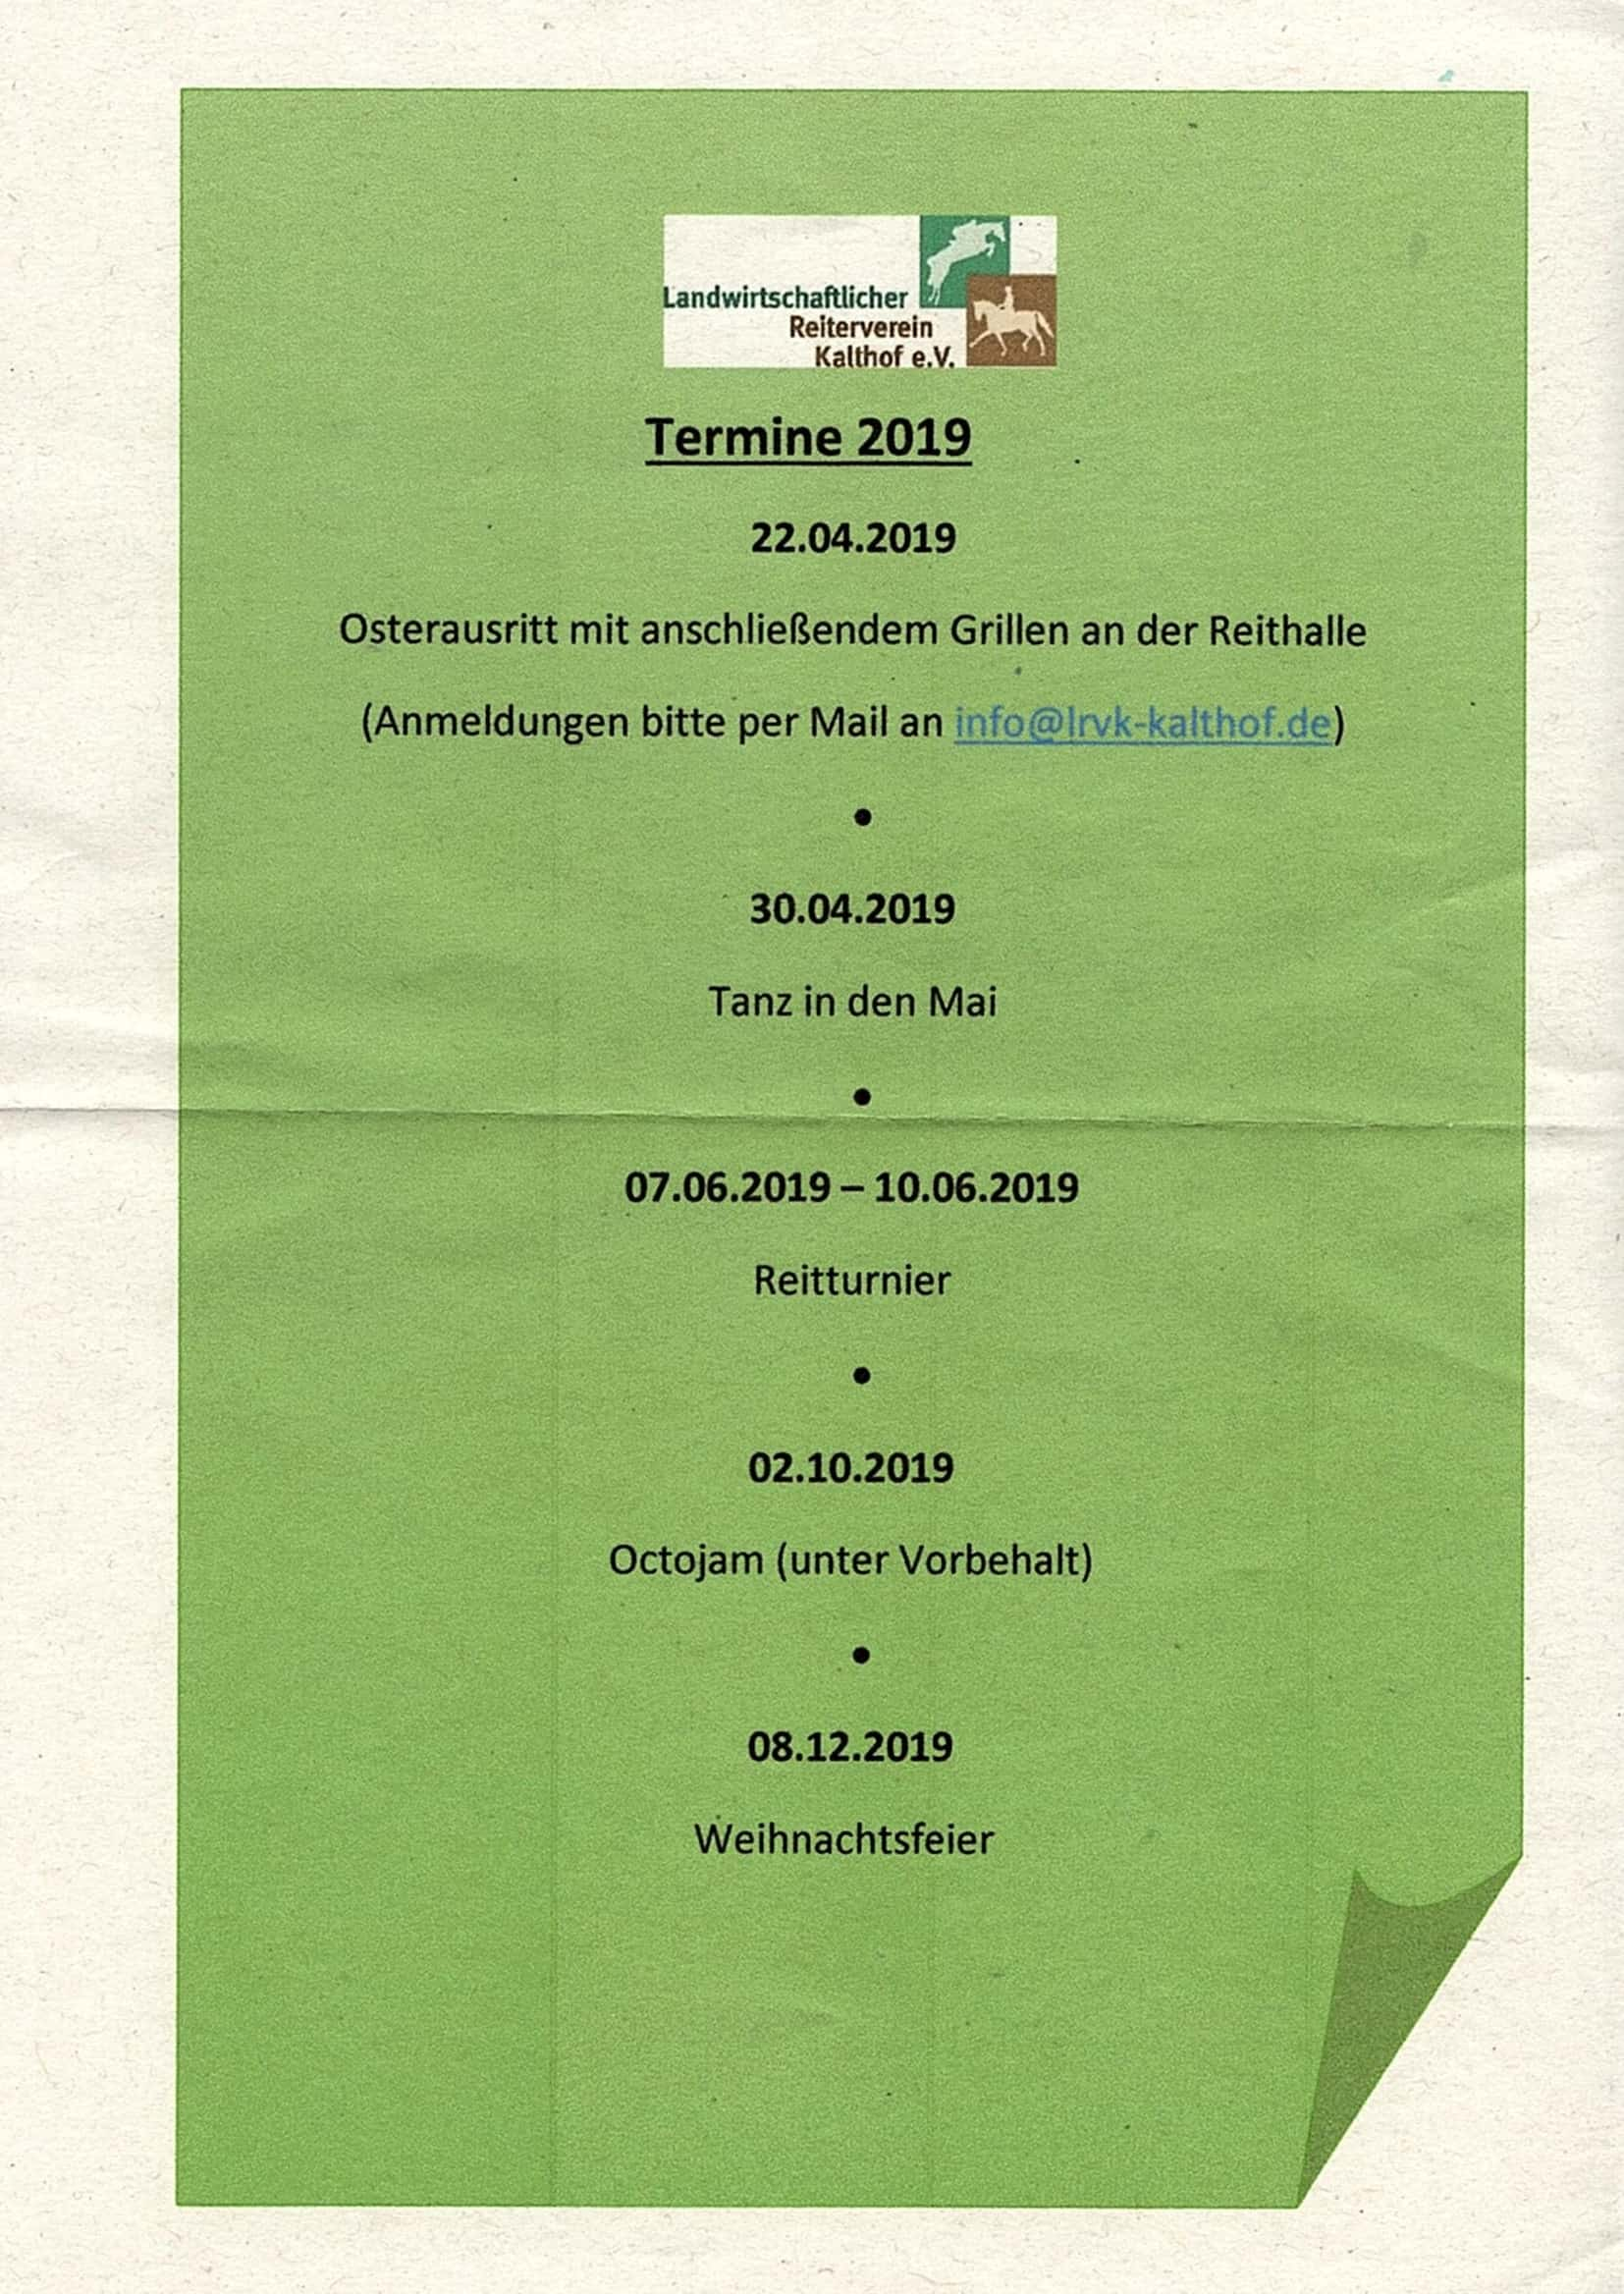 Termine Kalthof 2019